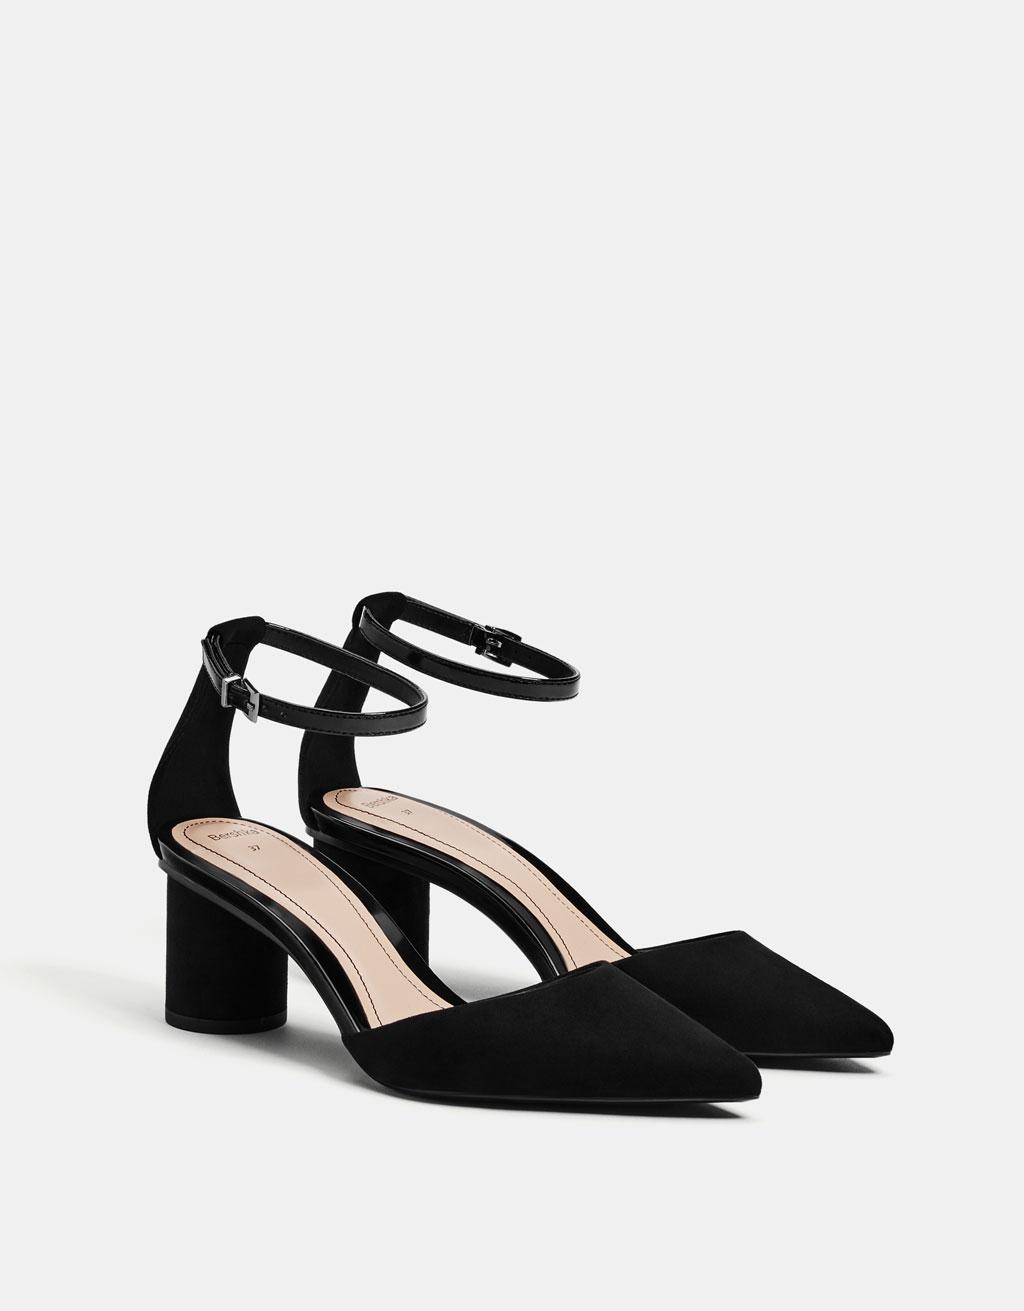 Black mid-heel d'Orsay shoes